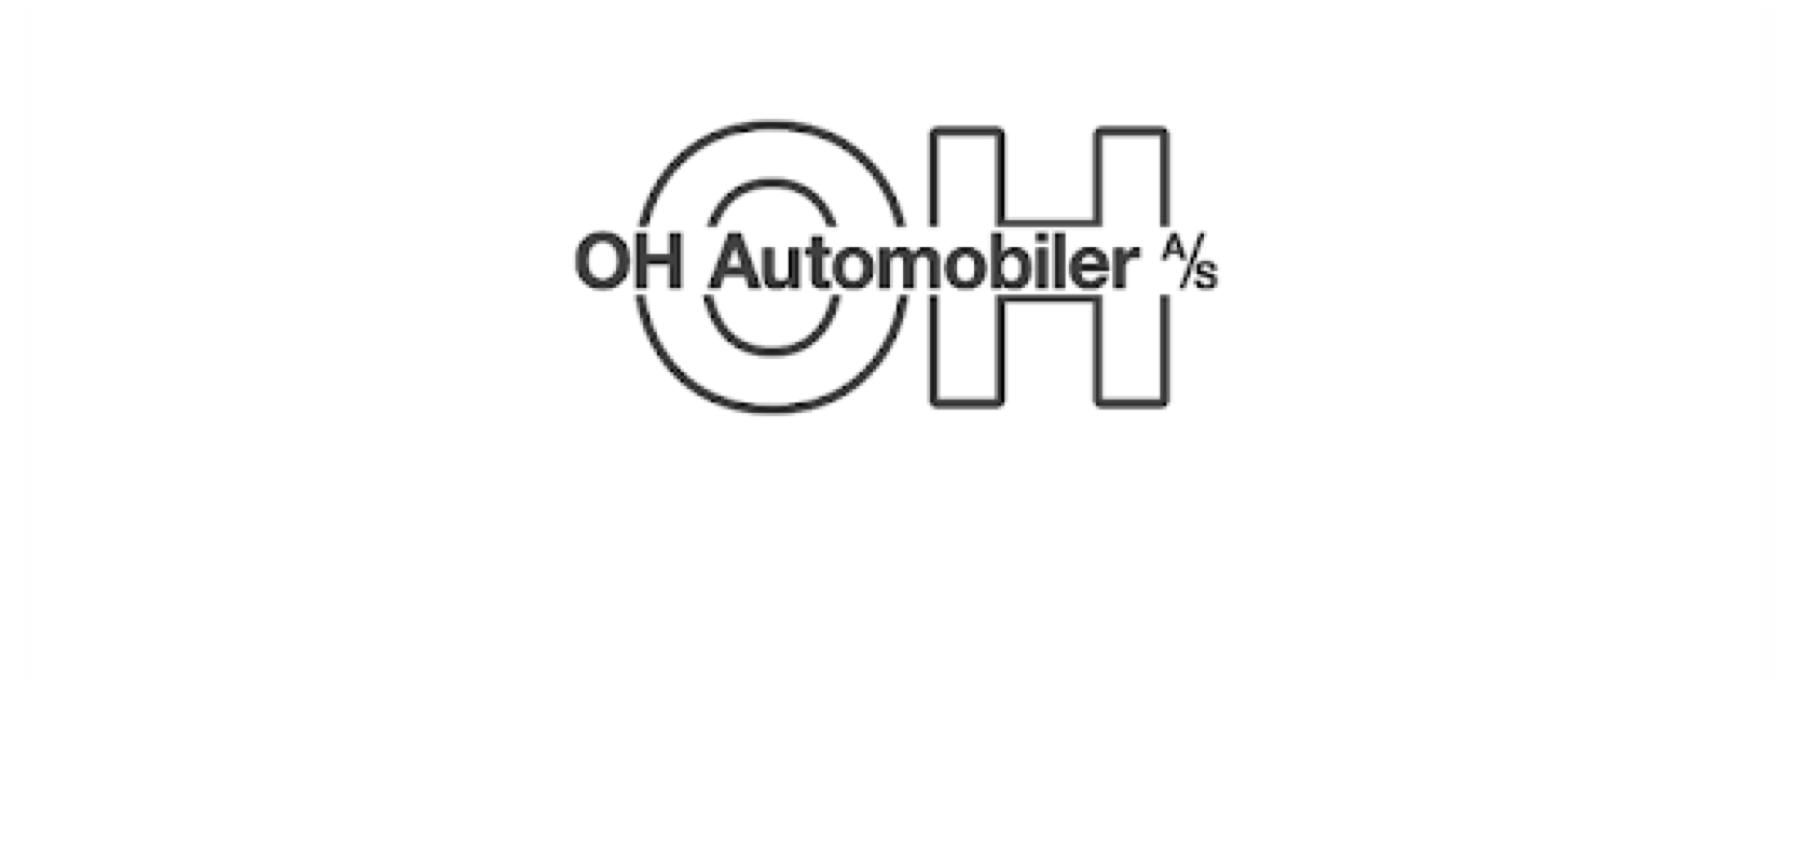 OH automobiler app